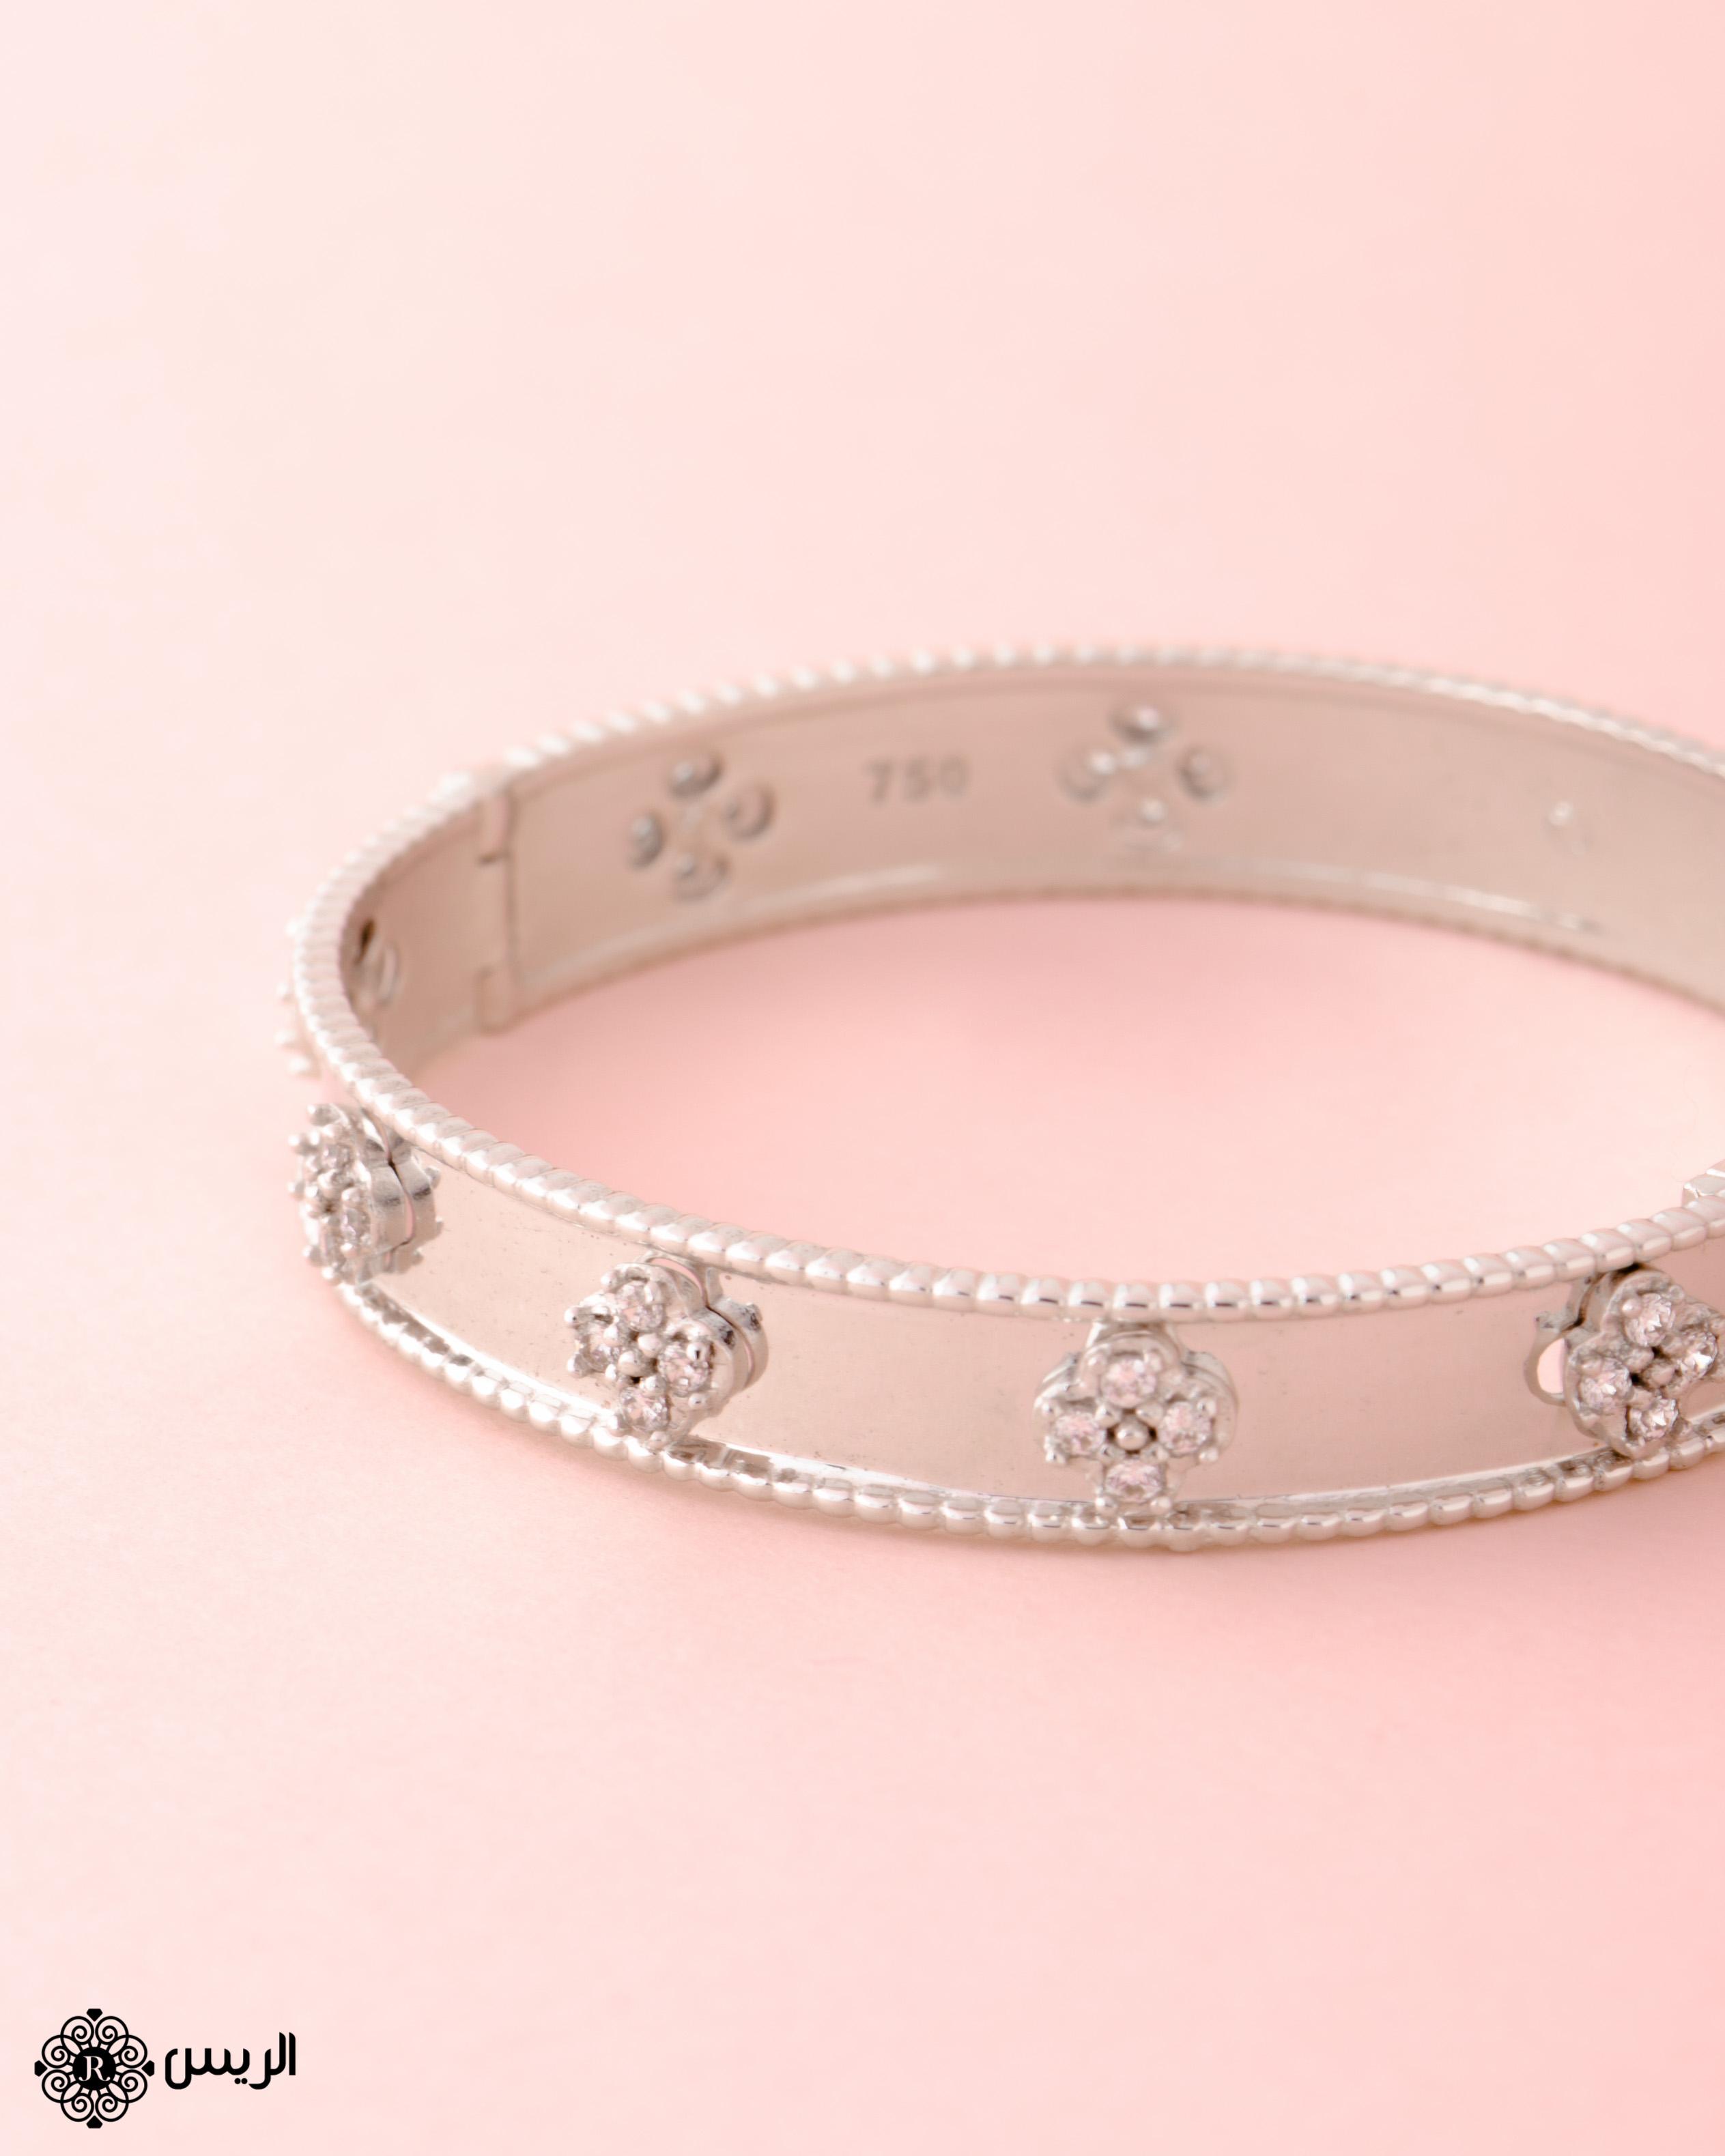 Raies jewelry Kids Bangle إسورة أطفال الريس للمجوهرات